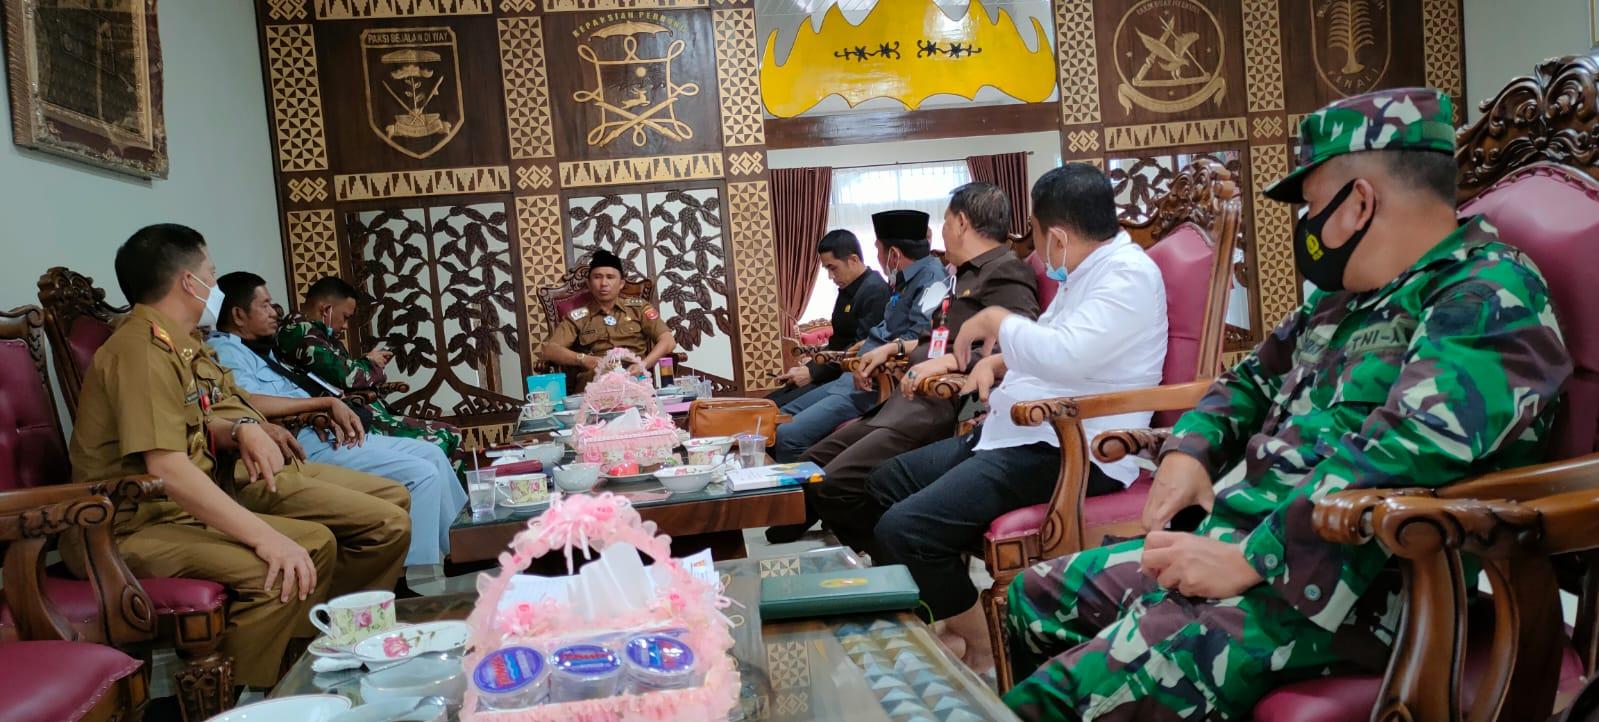 Bupati Parosil Minta Bantuan Pusat Hingga Ketua Komisi IV DPR, Tangani Konflik Gajah